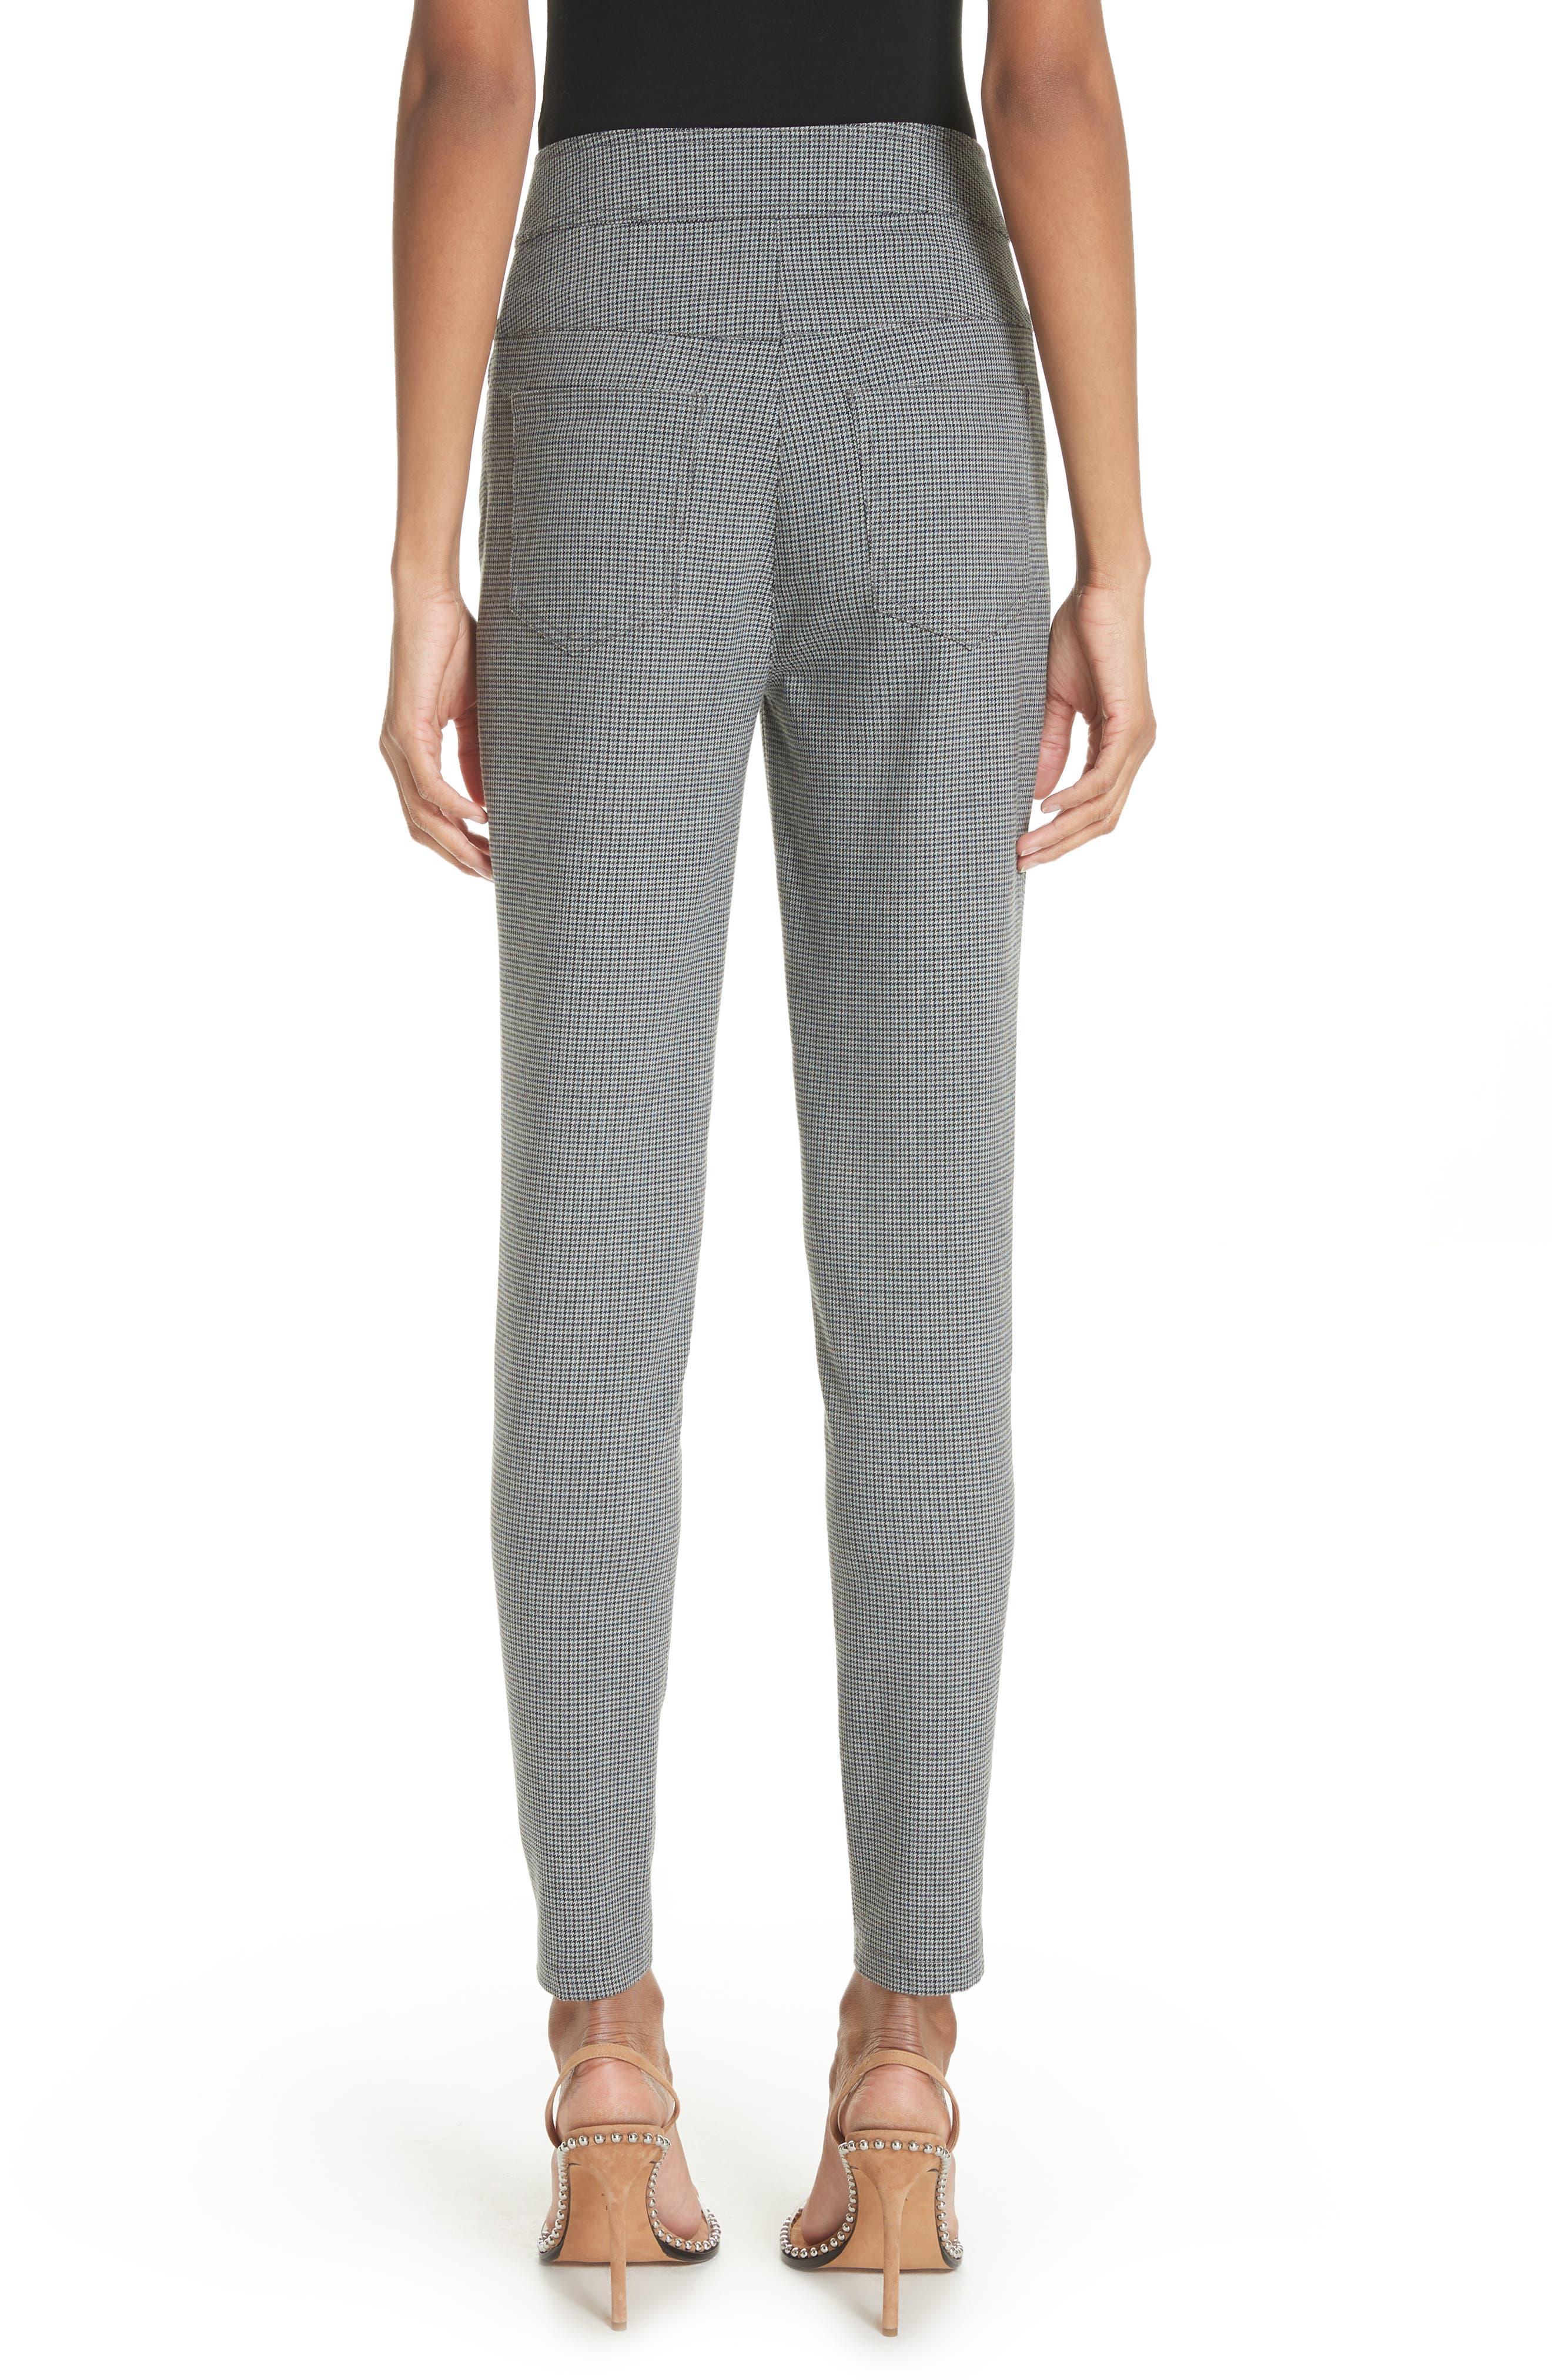 ALEXANDER WANG,                             Skinny Plaid Pants,                             Alternate thumbnail 2, color,                             020